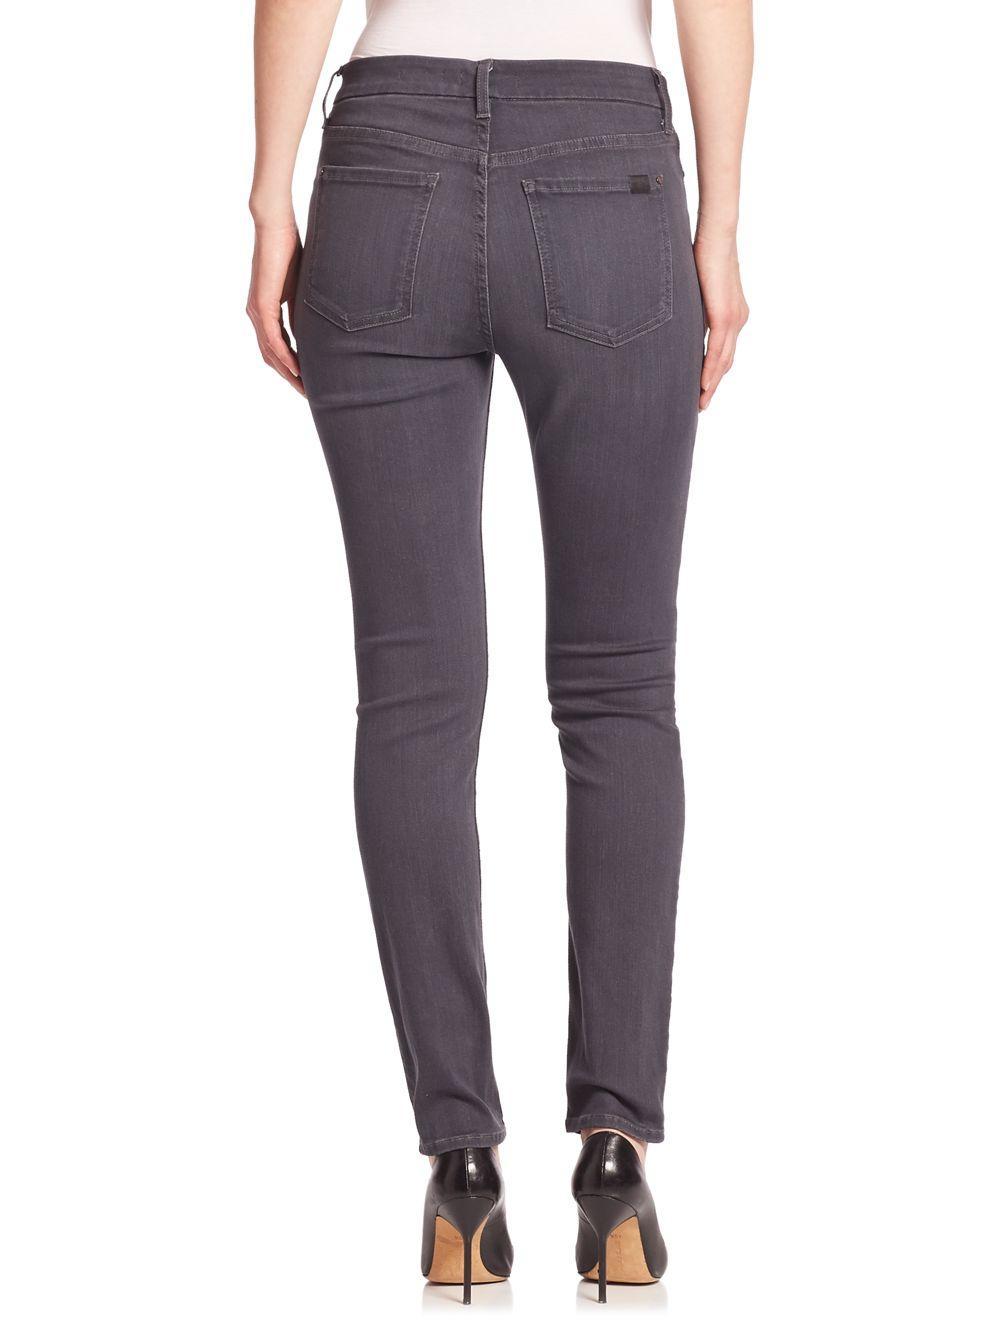 7 For All Mankind Denim Skinny Grey Jeans in Grey